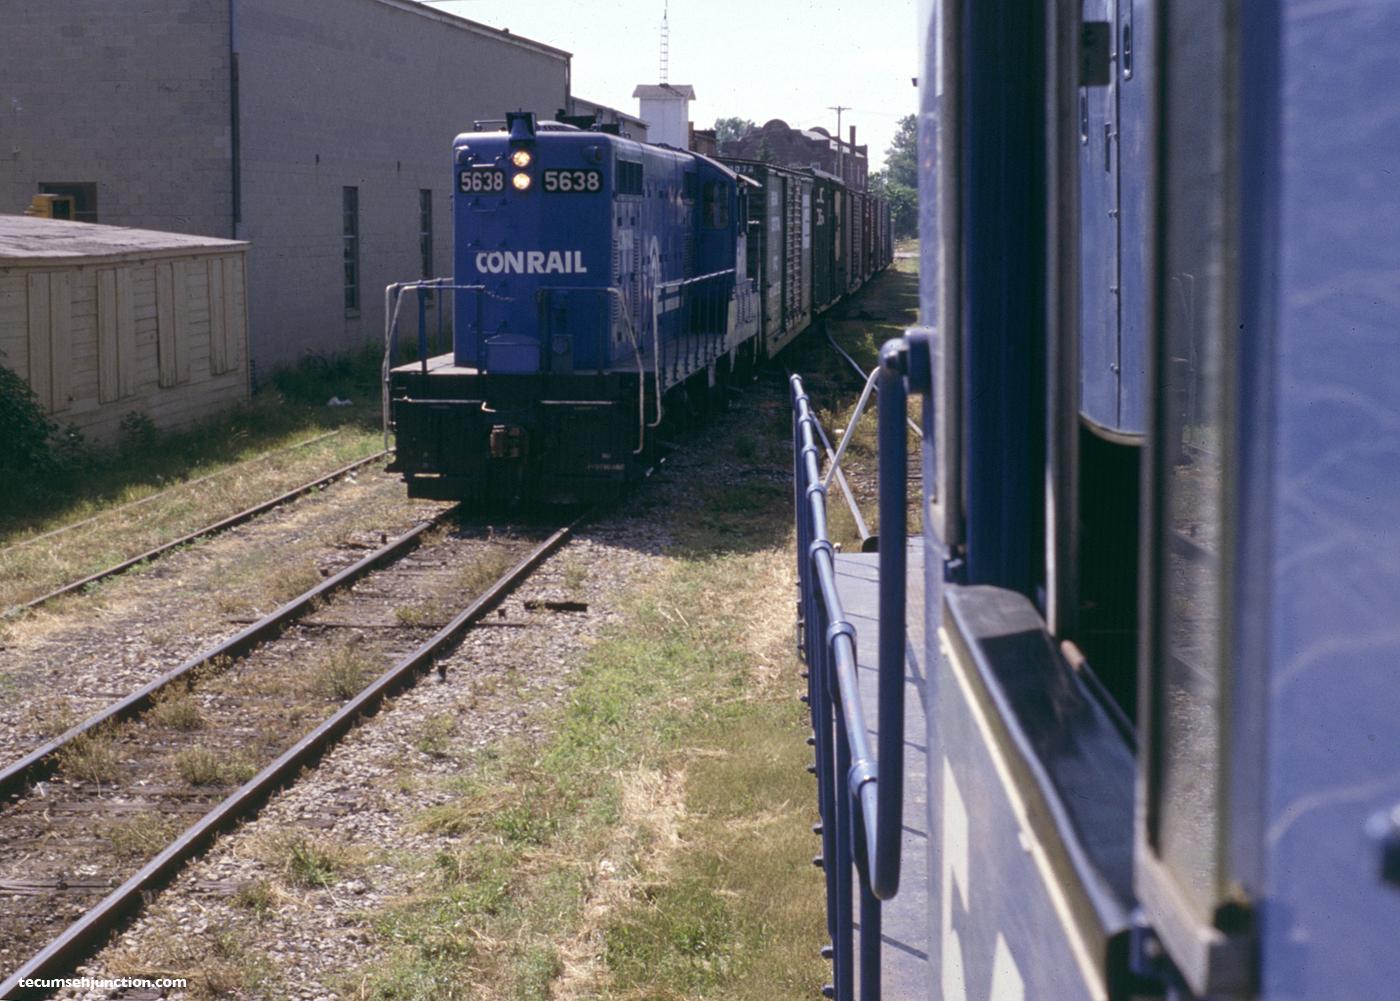 Conrail #5638 at Blissfield, MI on 26 June 1979